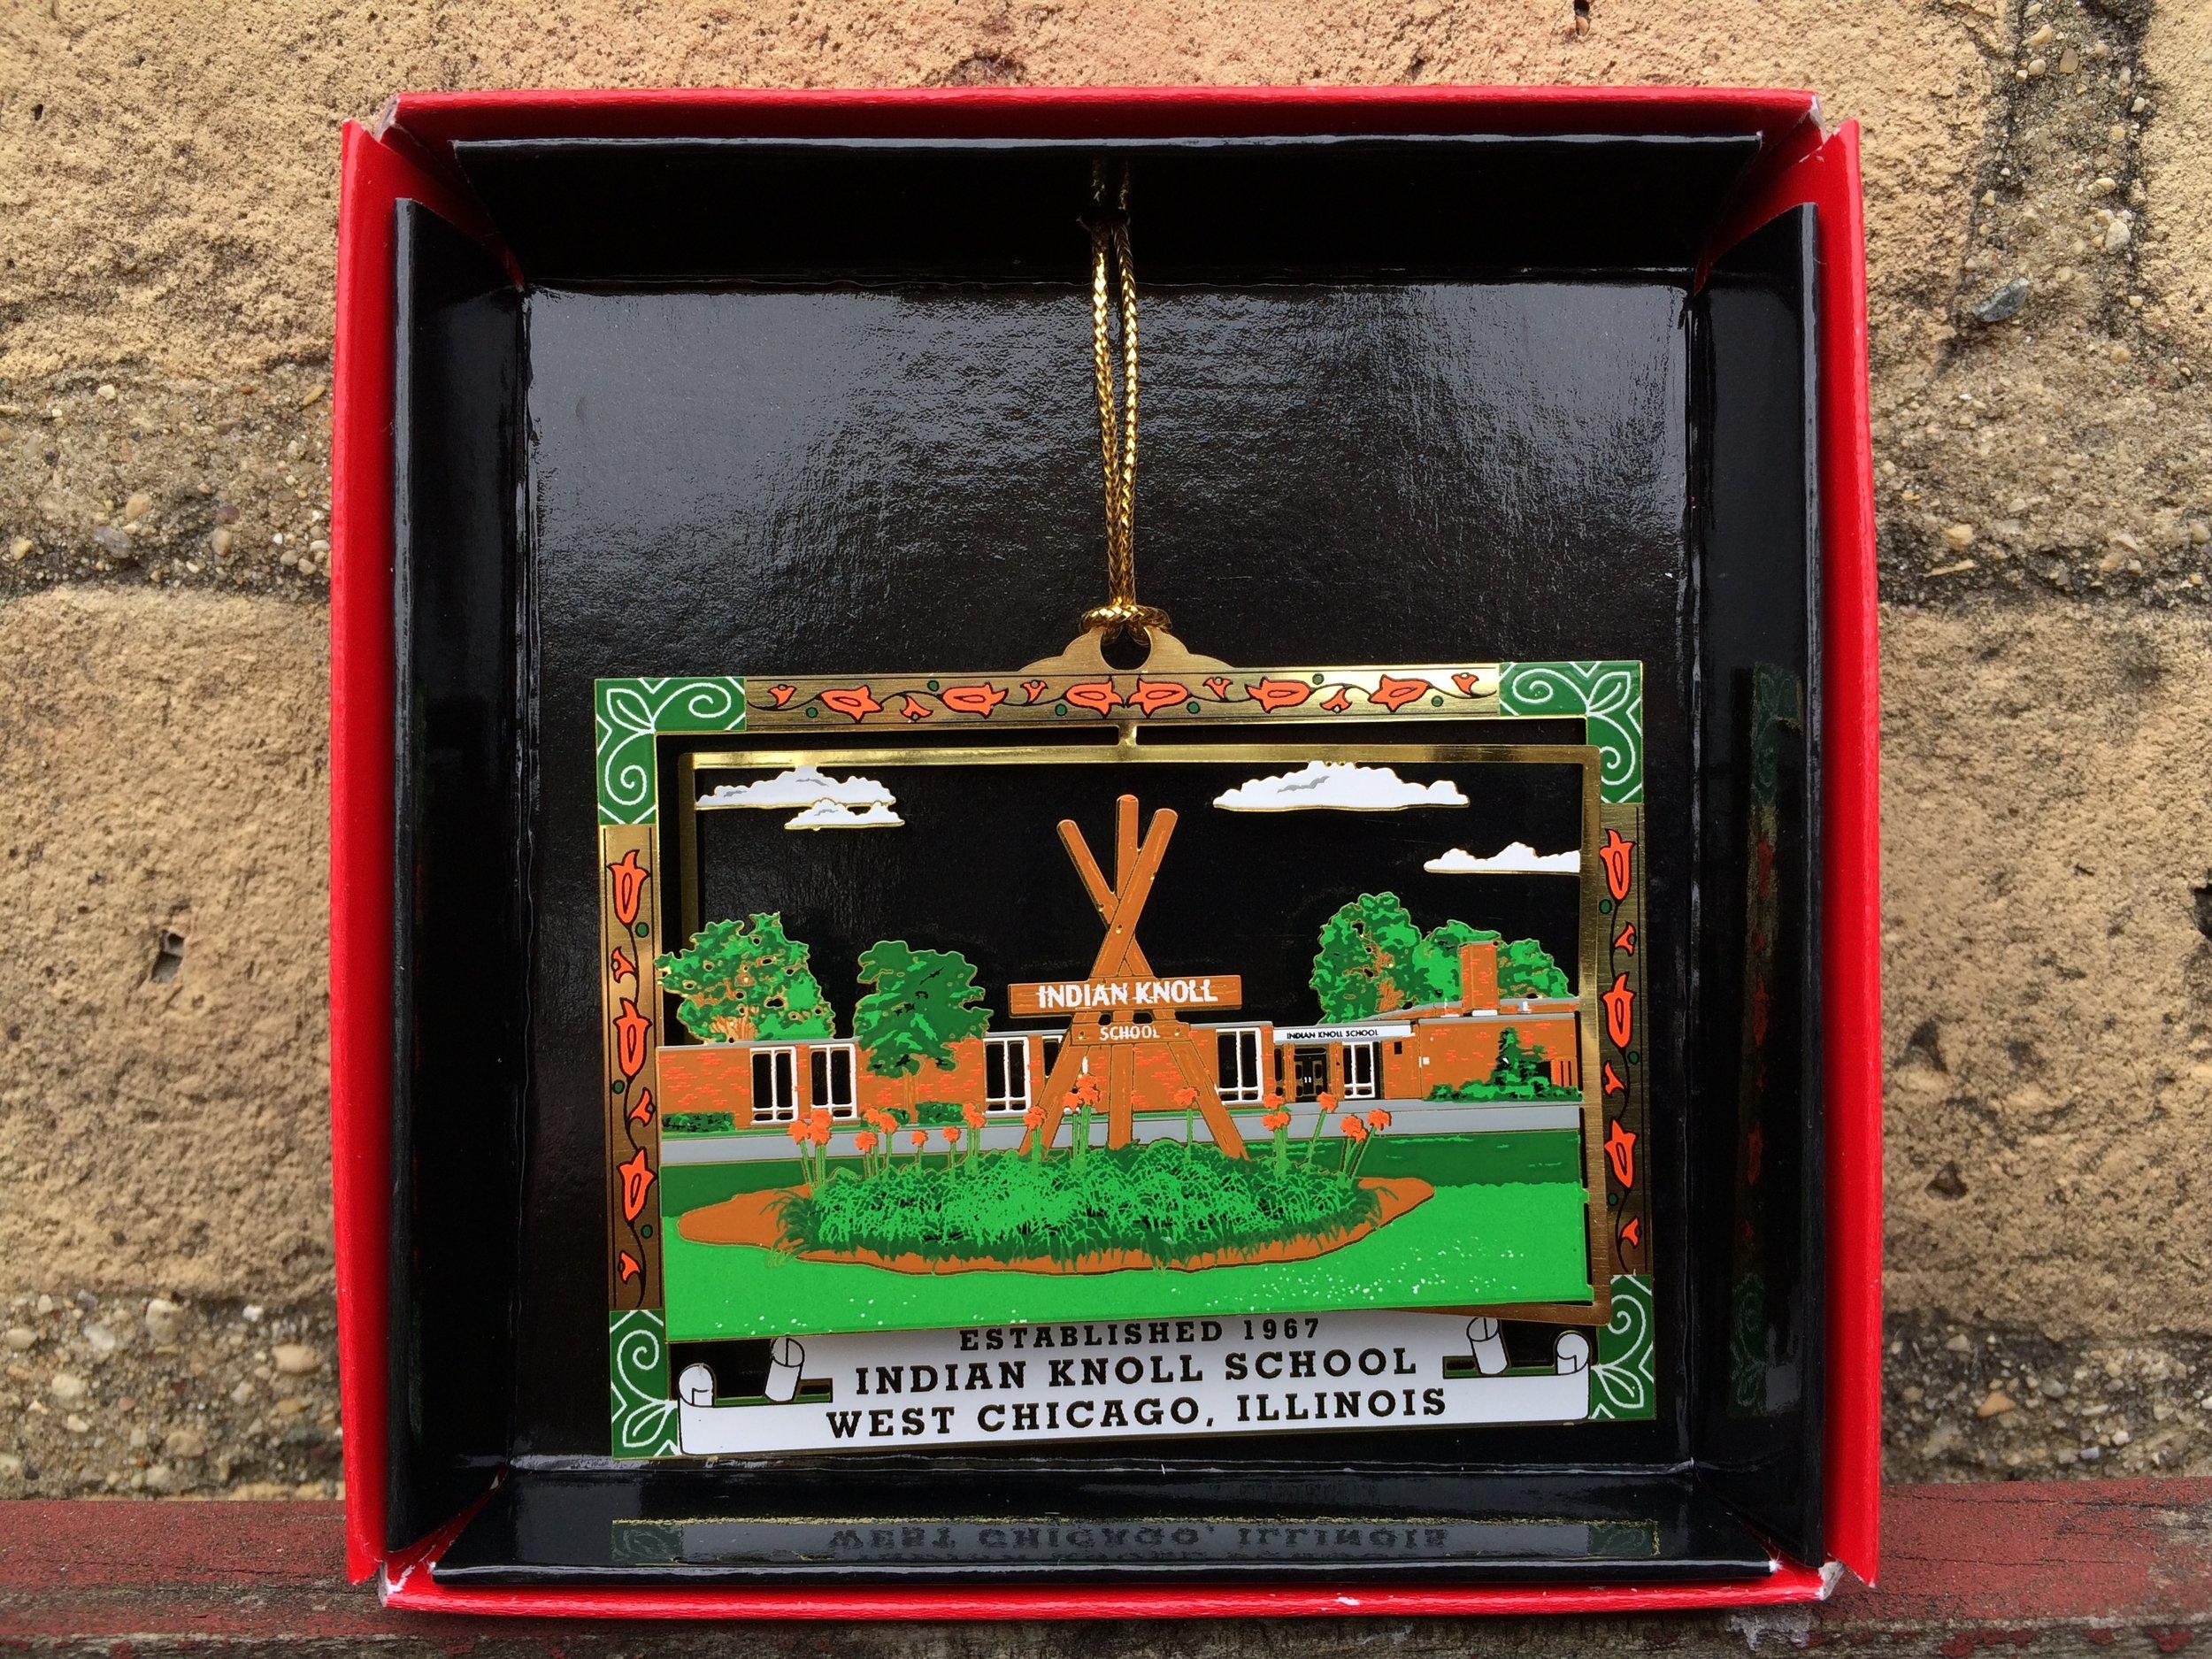 2017 indian knoll school anniverary ornament.jpg